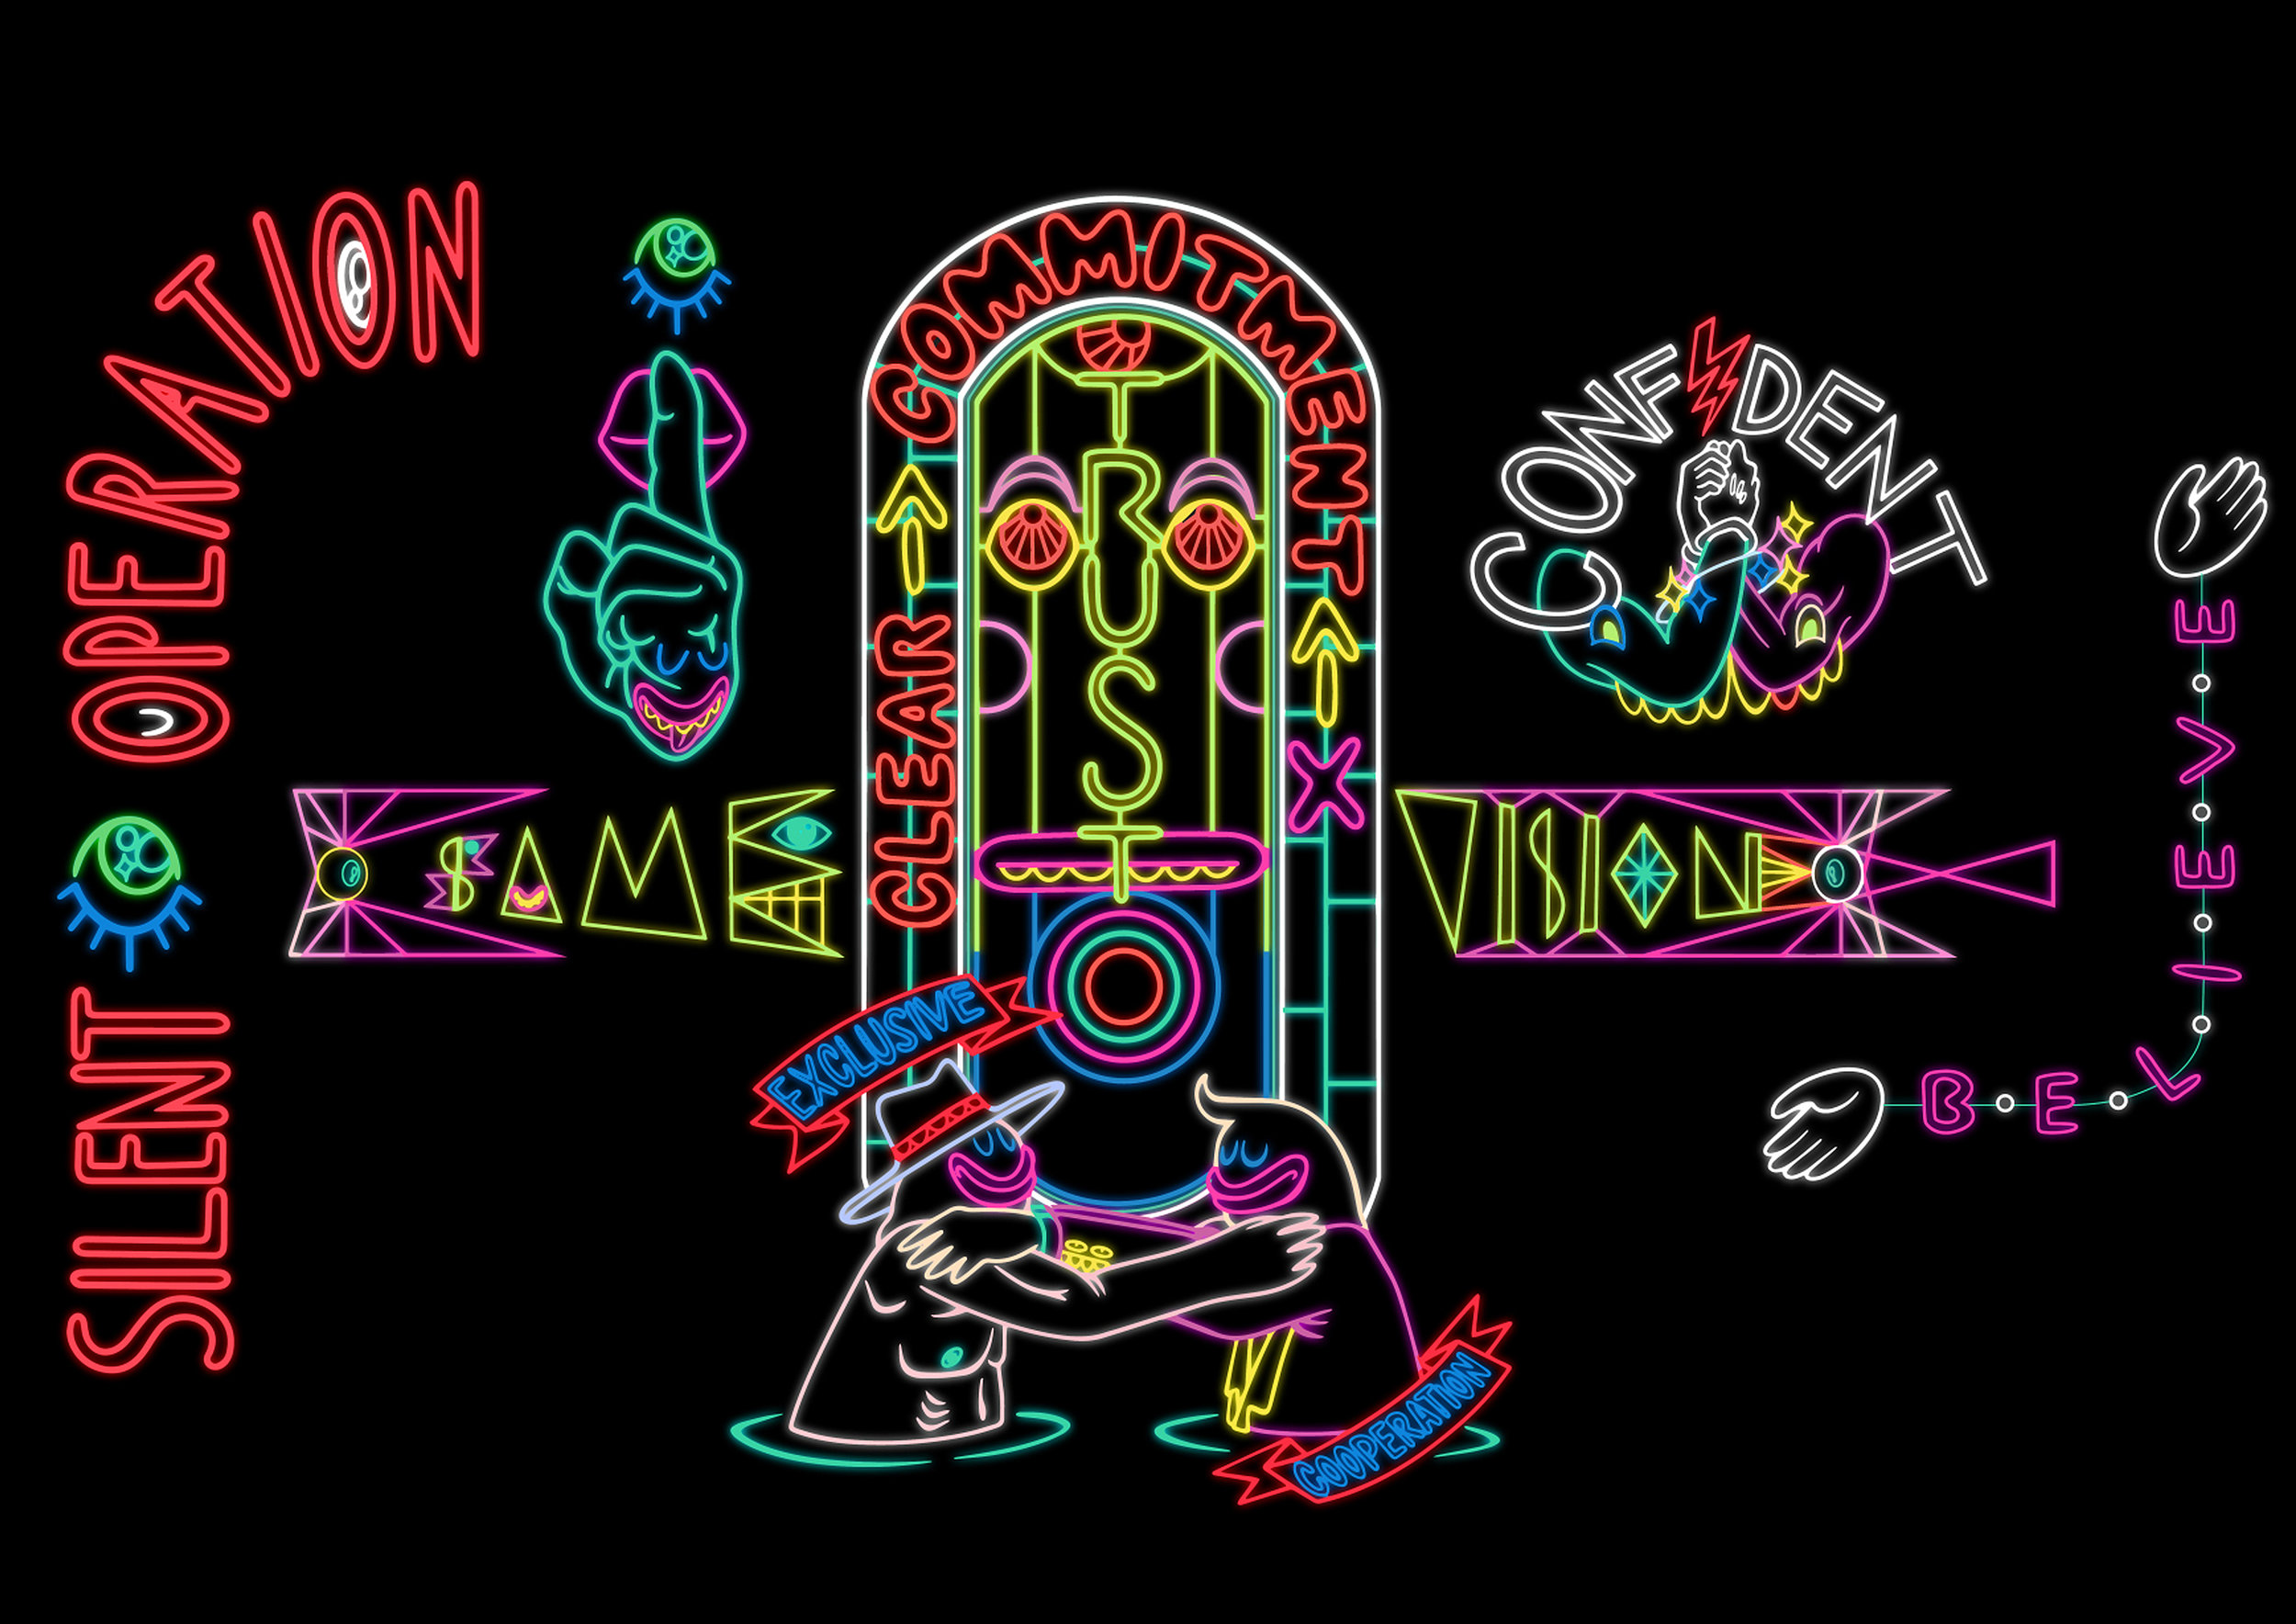 Uji 'Hahan' Handoko Eko Saputro & Adi 'Uma Gumma' Kusuma   Silent operation: Sign study based on the formula of contemporary (visual) art  2018-19 installation comprising neon wall-works and interactive game application  Commissioned and purchased 2019